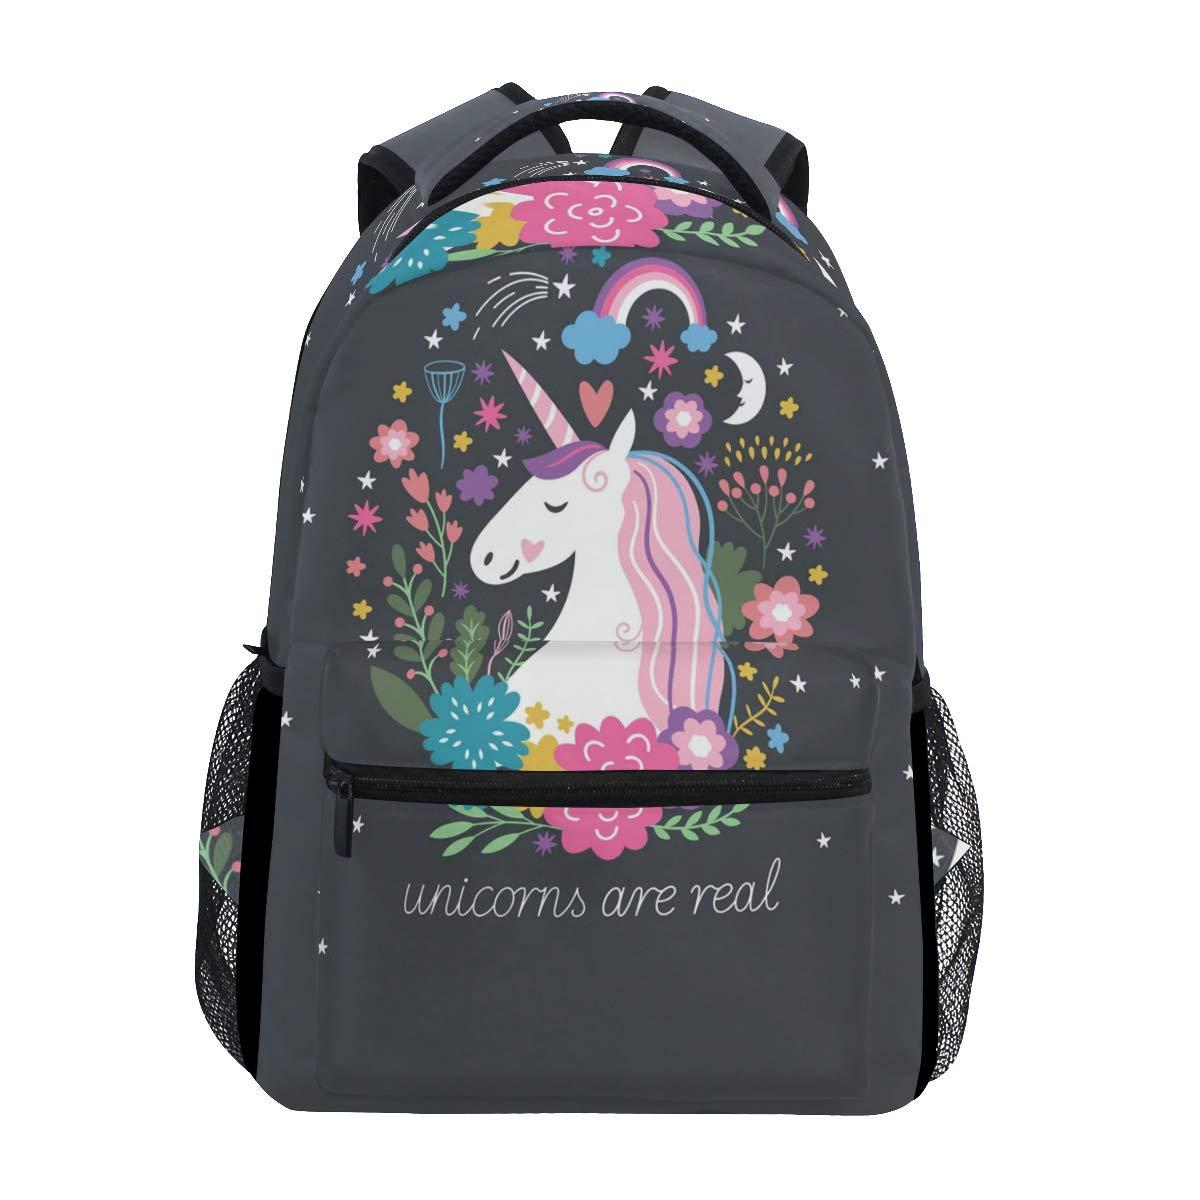 ZZKKO Animal Unicorn Boys Girls School Computer Backpacks Book Bag Travel Hiking Camping Daypack by ZZKKO